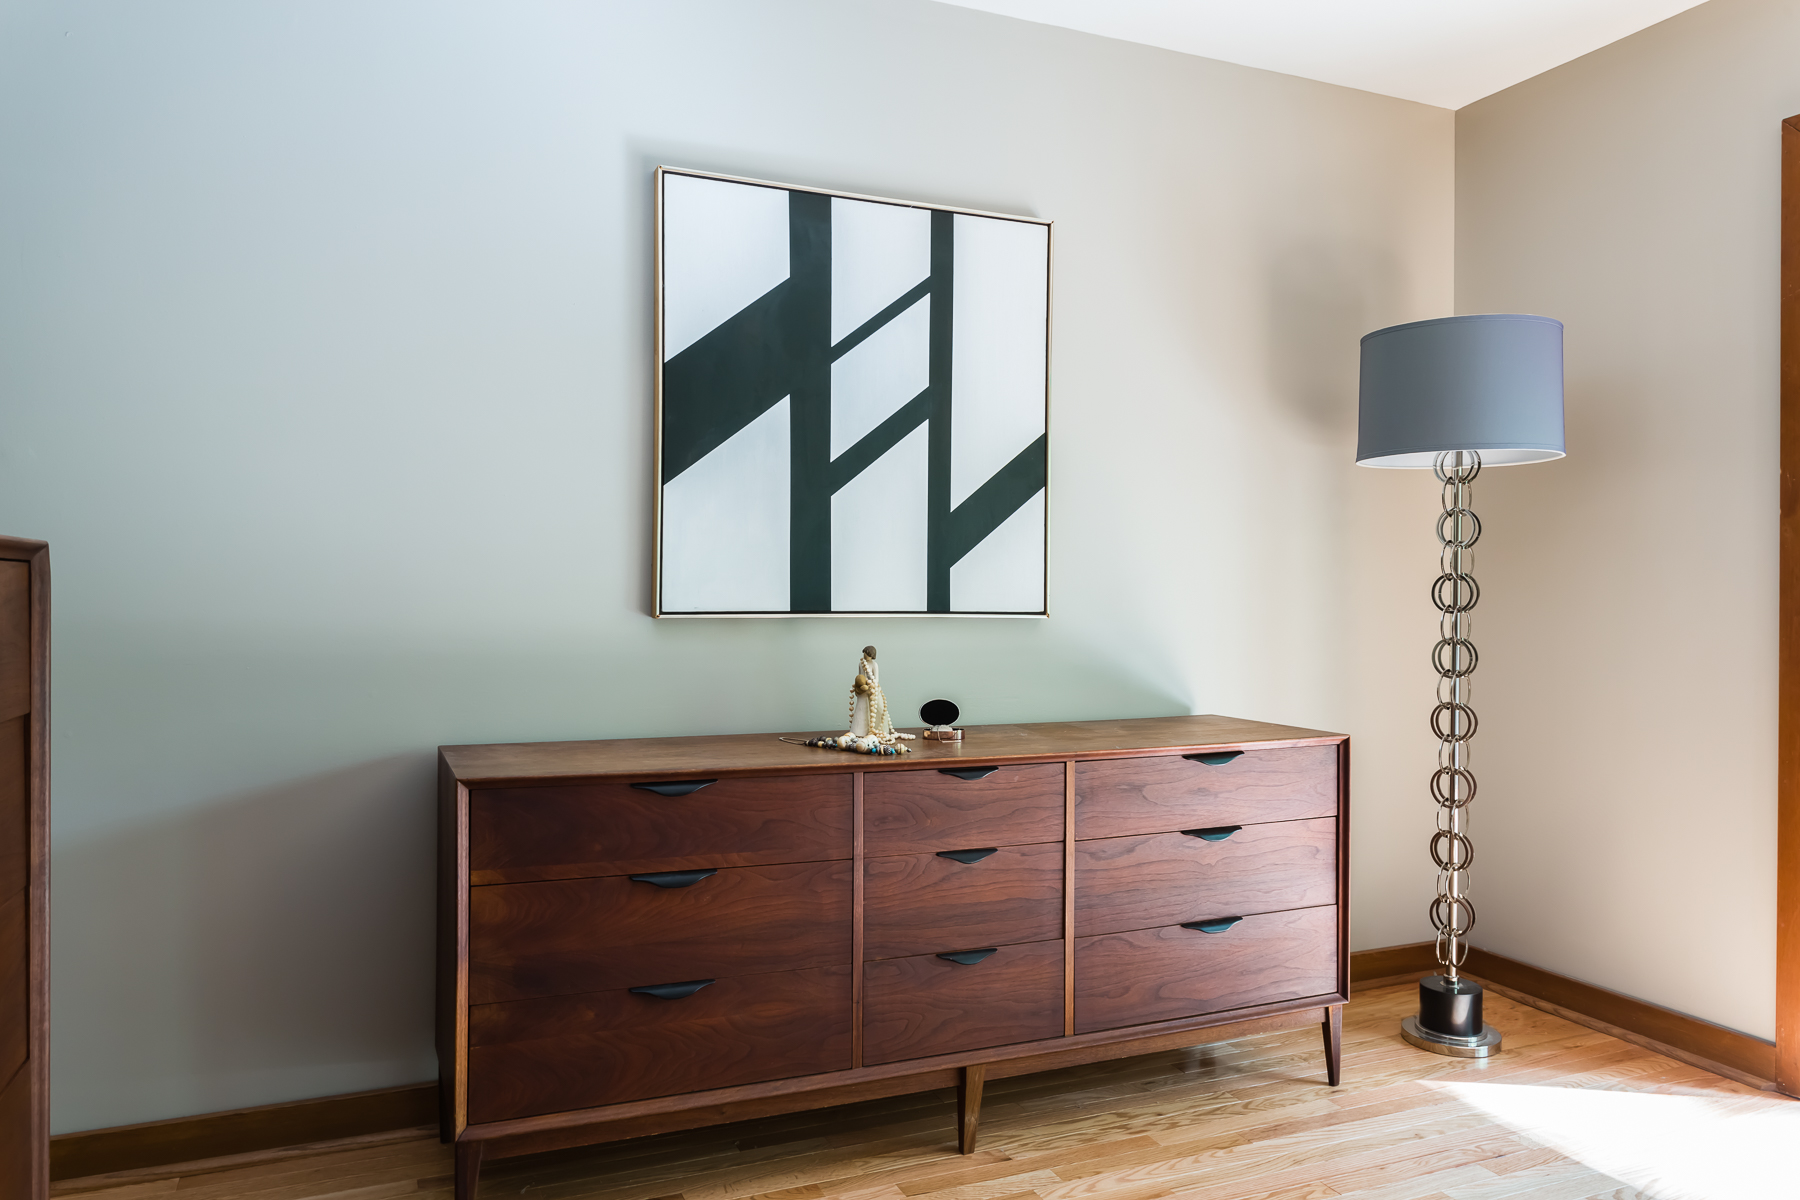 Minimalist Interior Design - Form & Function